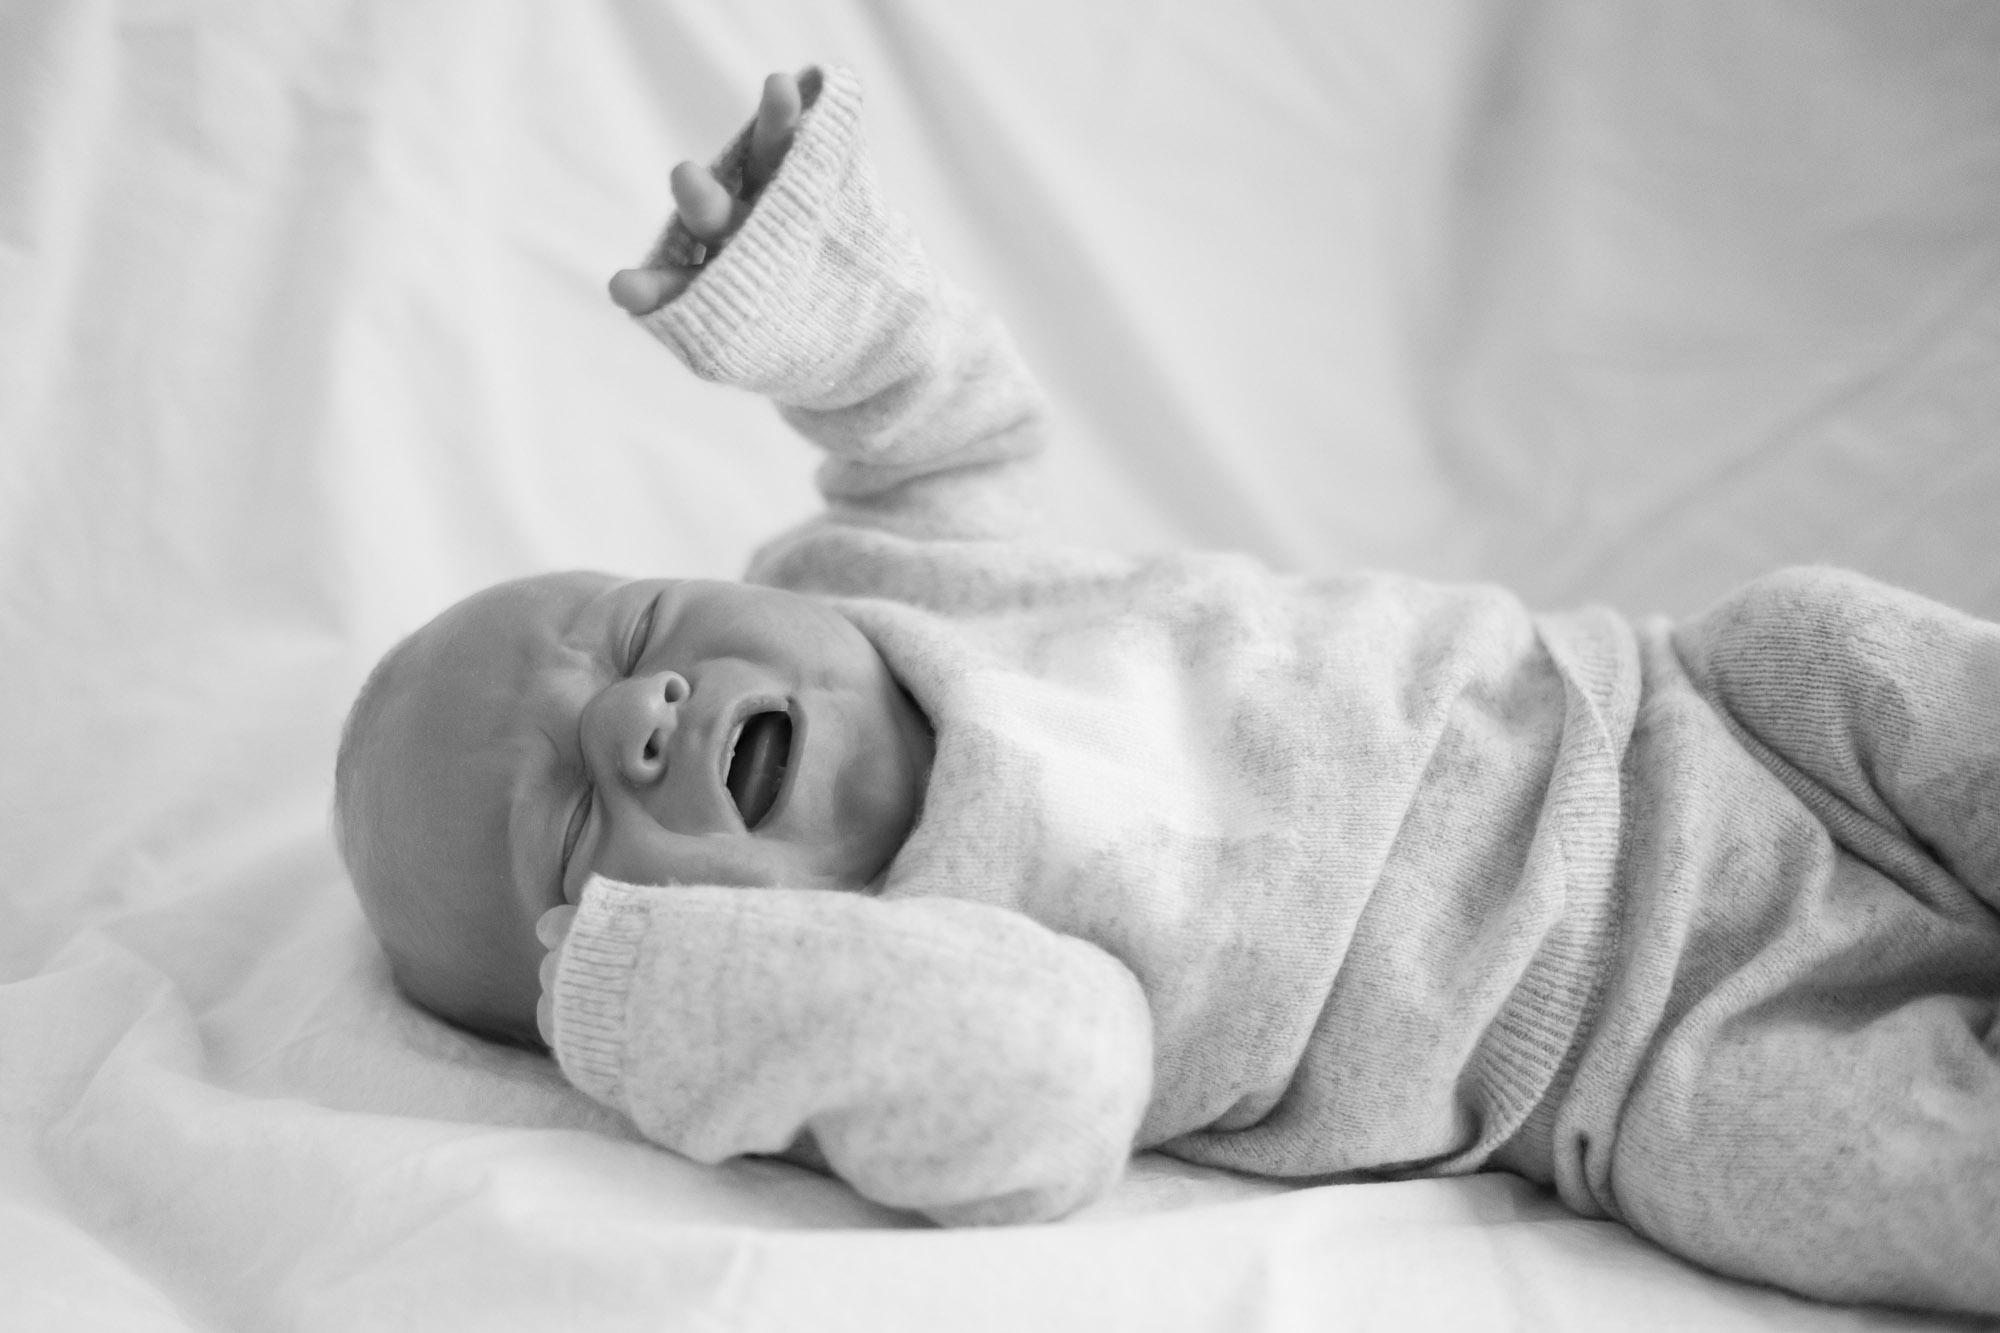 newborn-baby-family-portrait-photographer-128.jpg